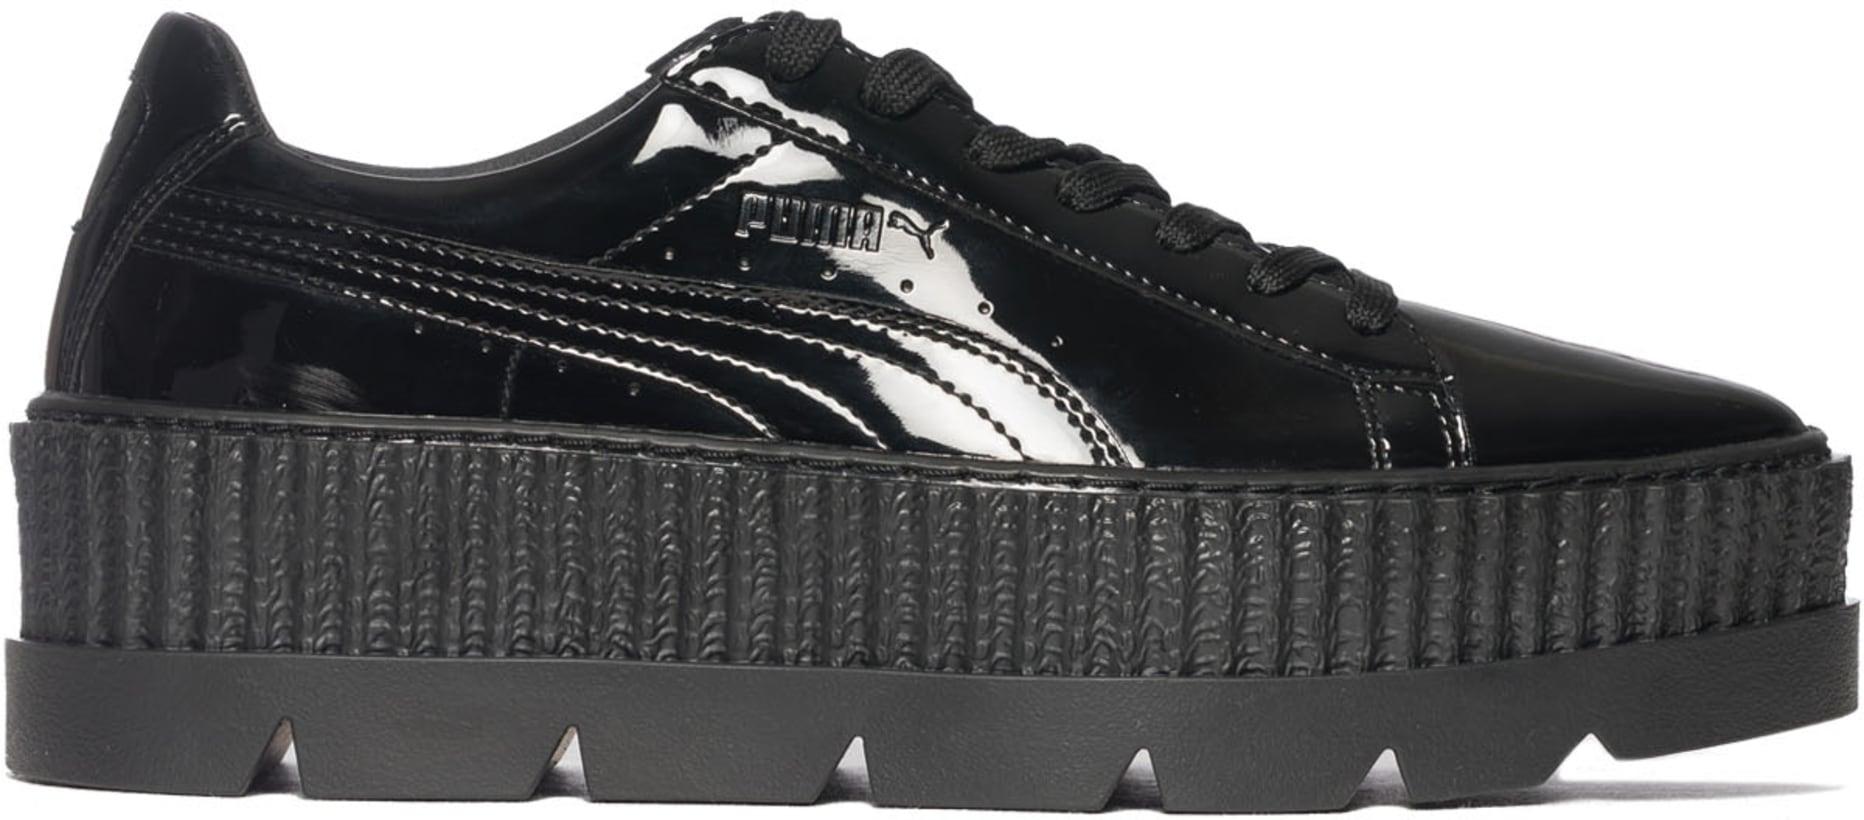 sports shoes e686b bd404 Puma - Fenty Pointy Creeper Patent - Black